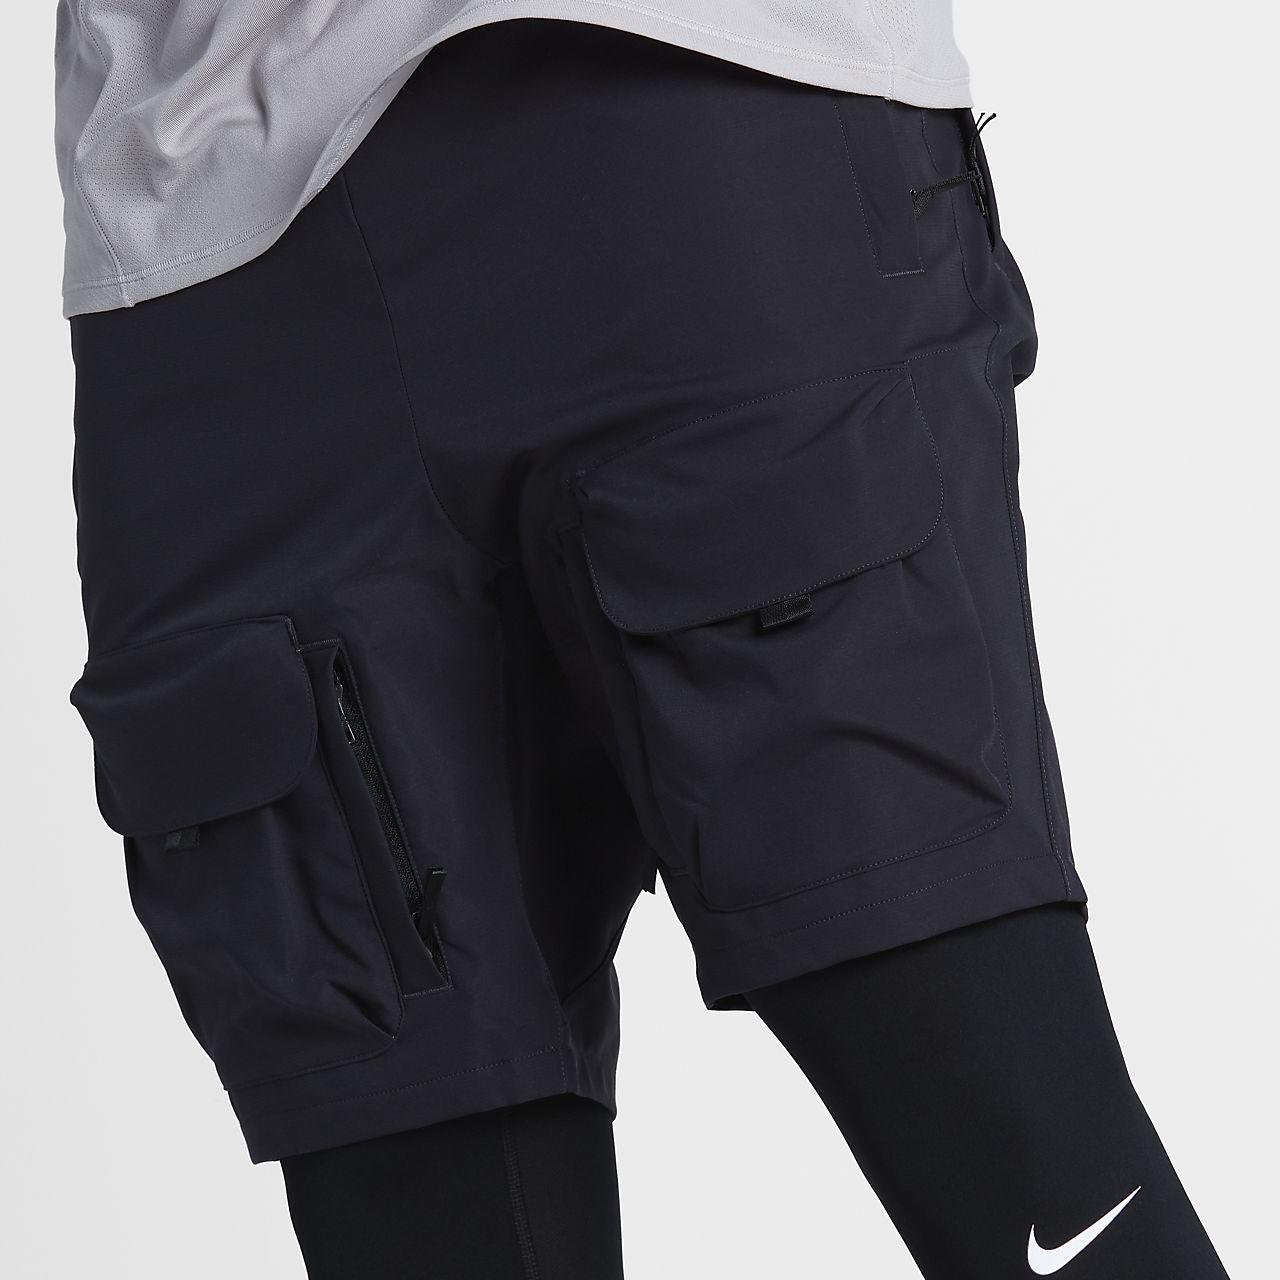 Nike AAE 1.0 Stretch 男子短裤